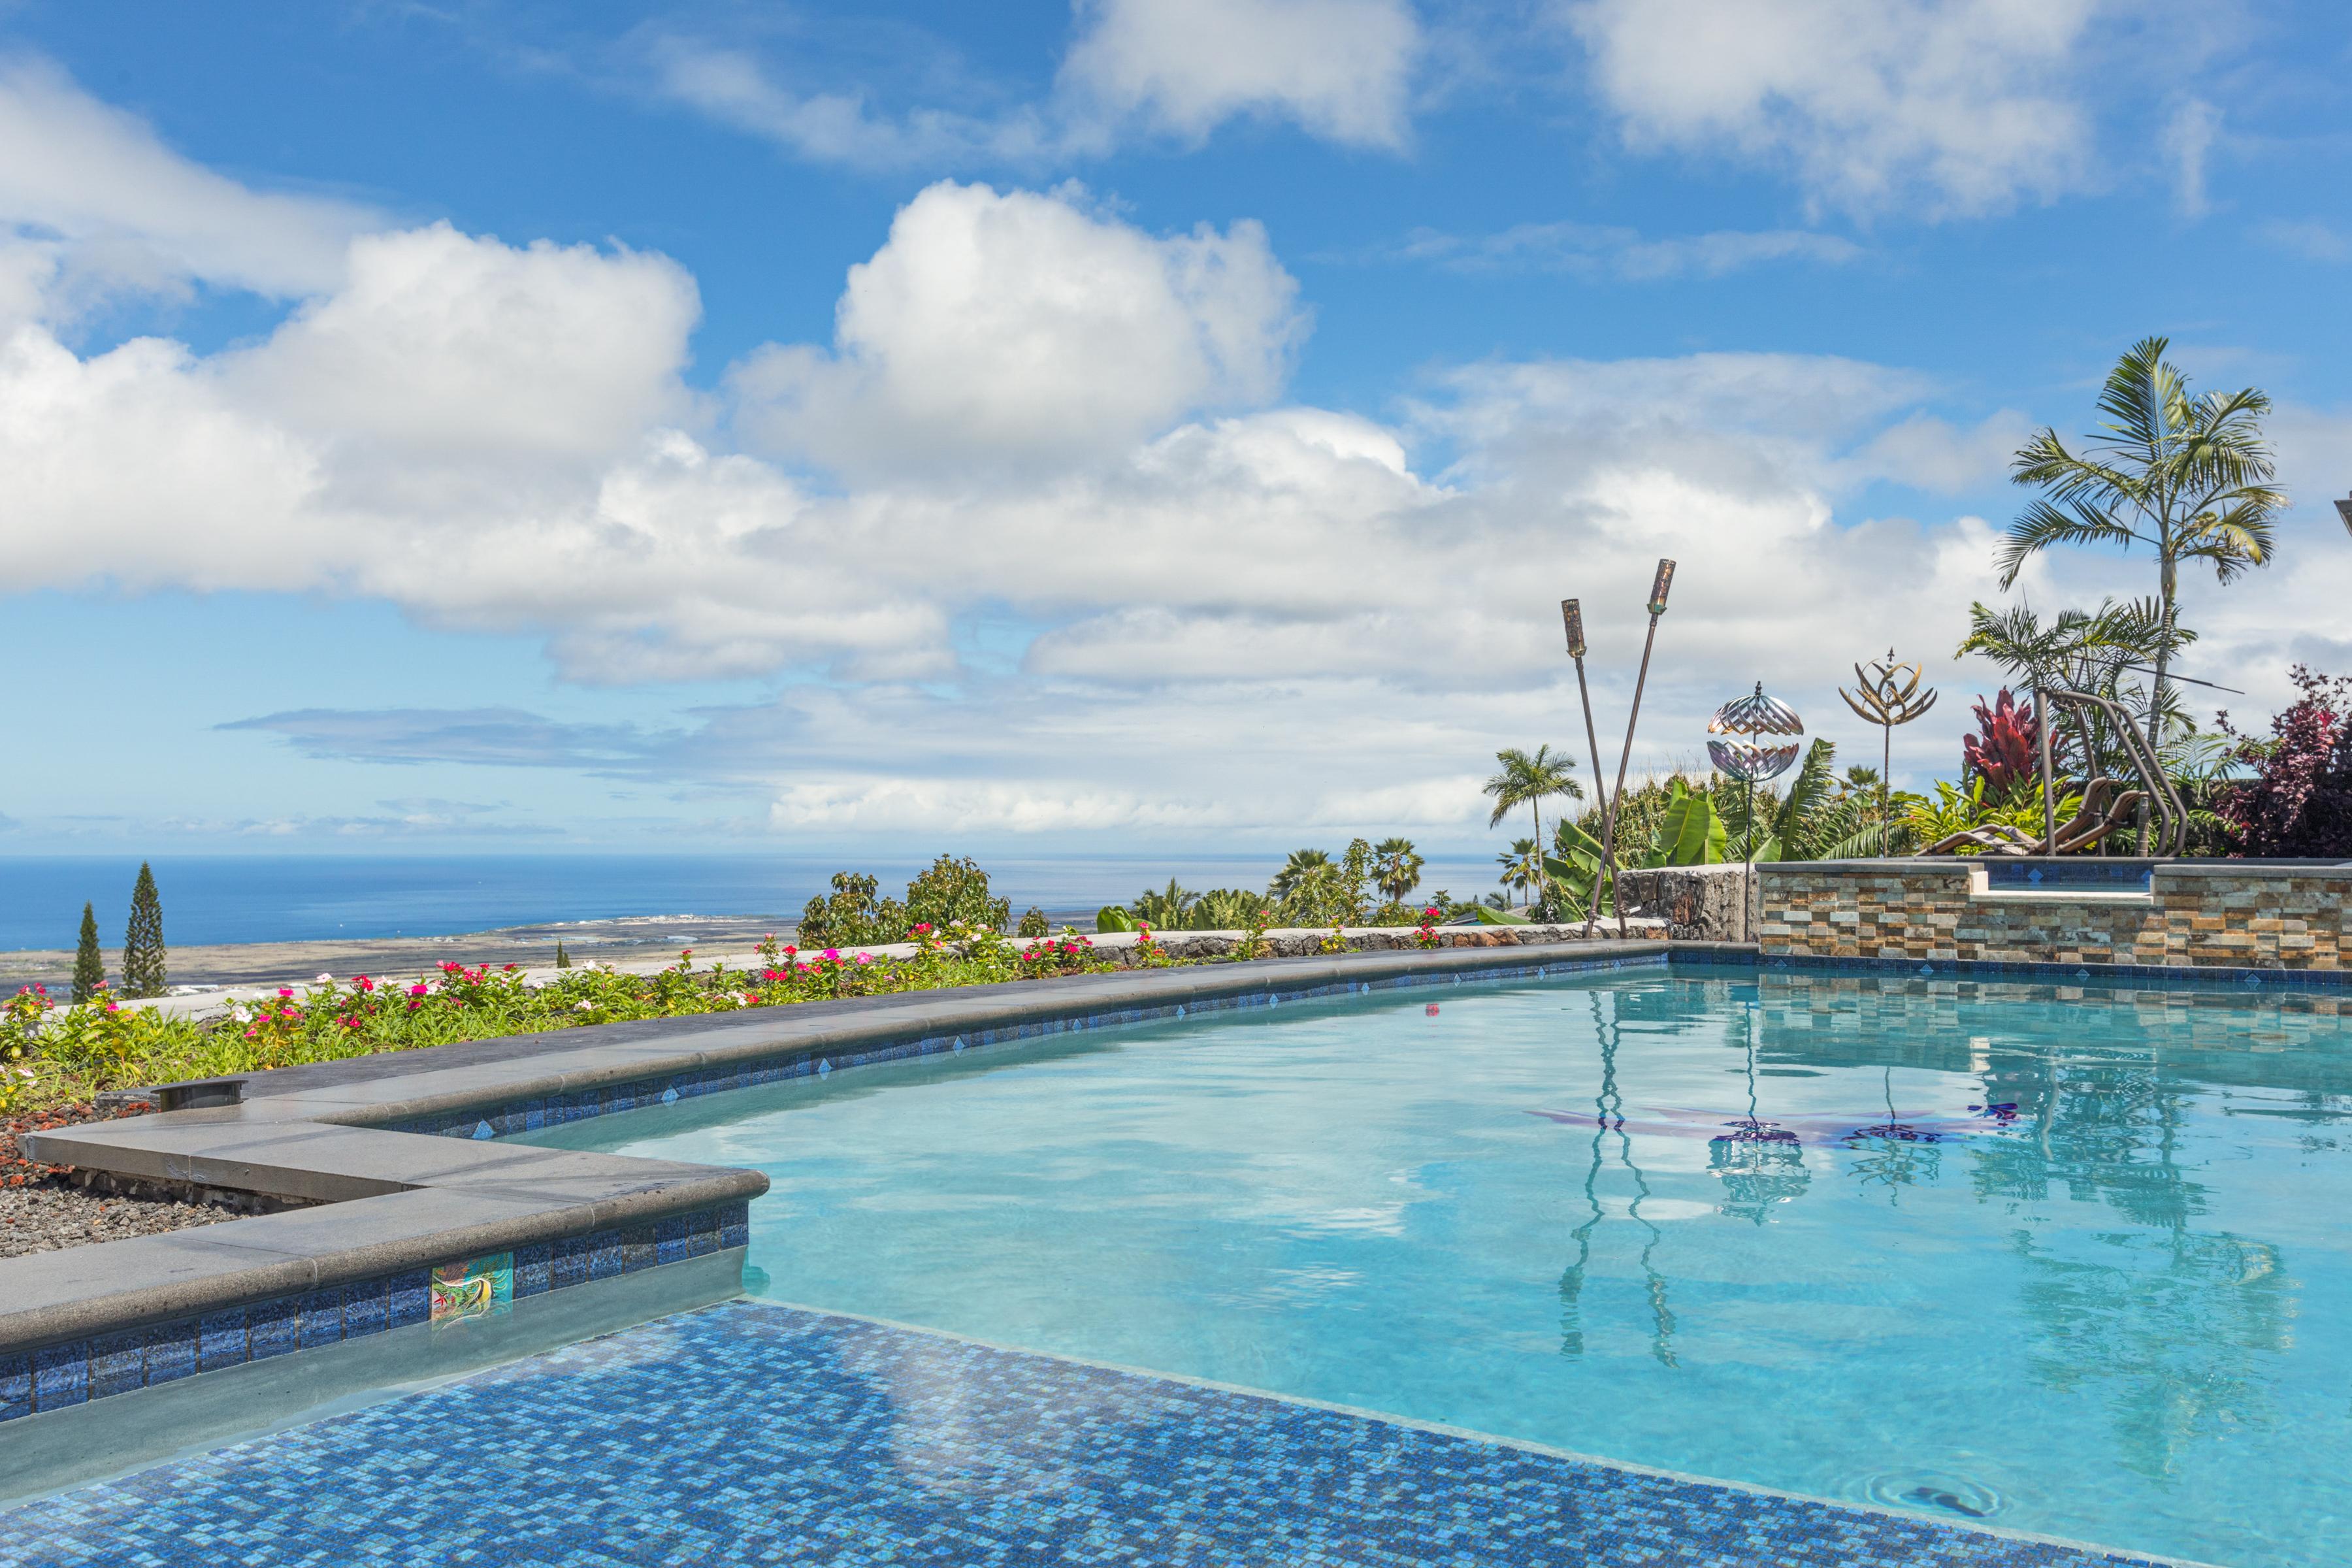 Kailua Kona HI Vacation Rental Welcome to Kailua